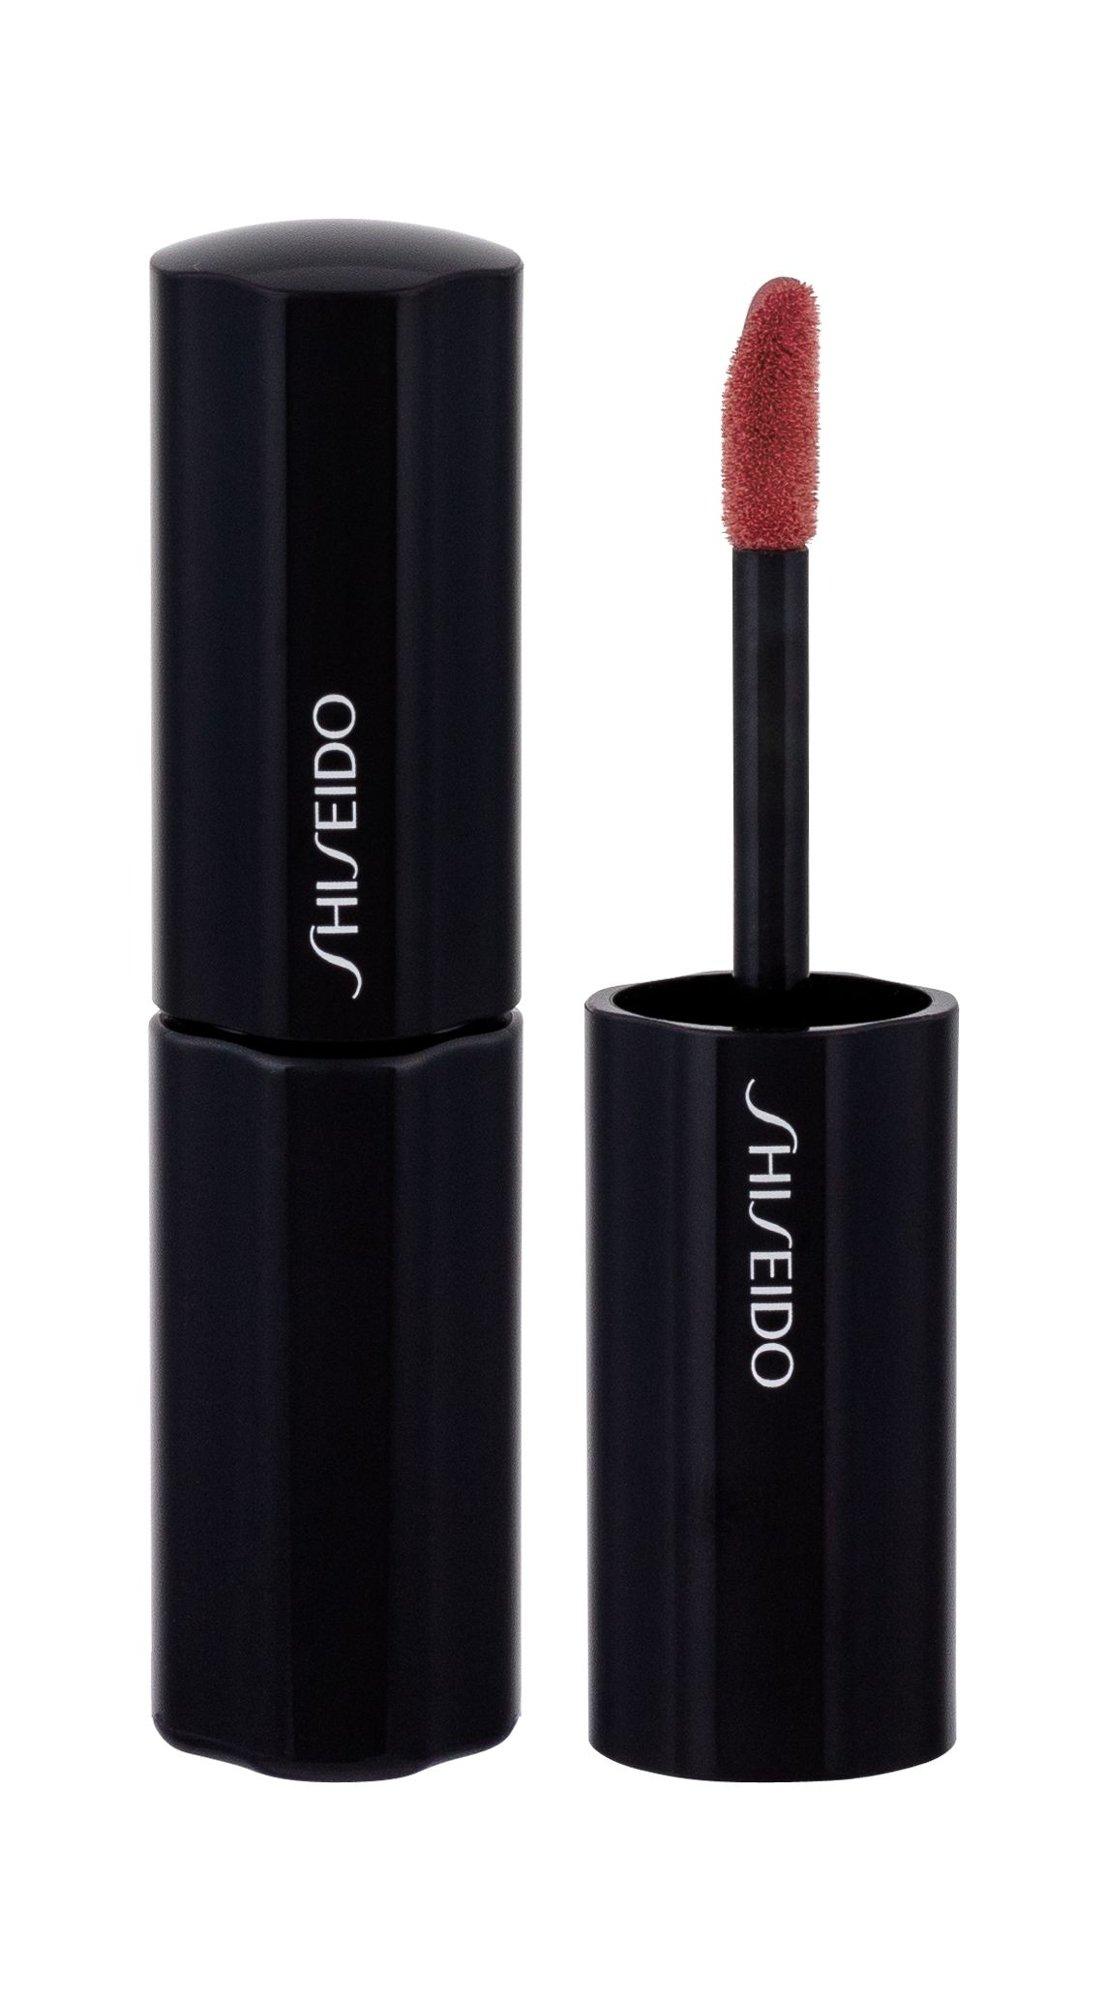 Shiseido Lacquer Rouge Lipstick 6ml RD320